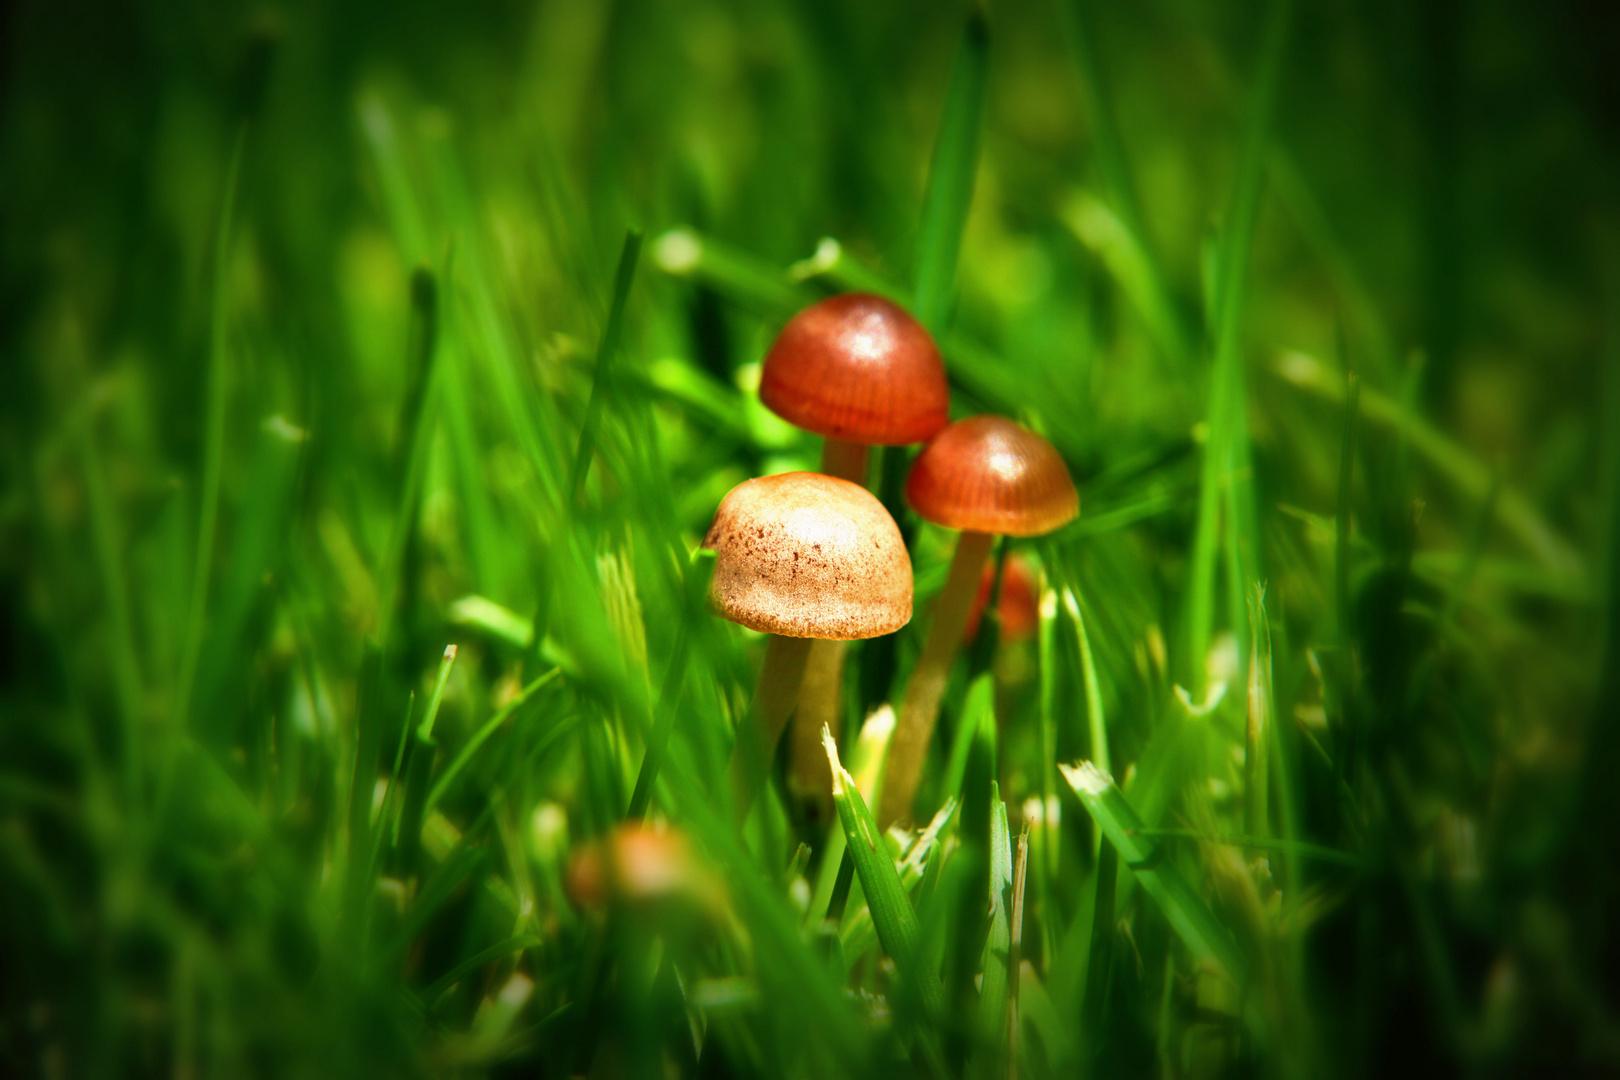 Minipilze im Gras